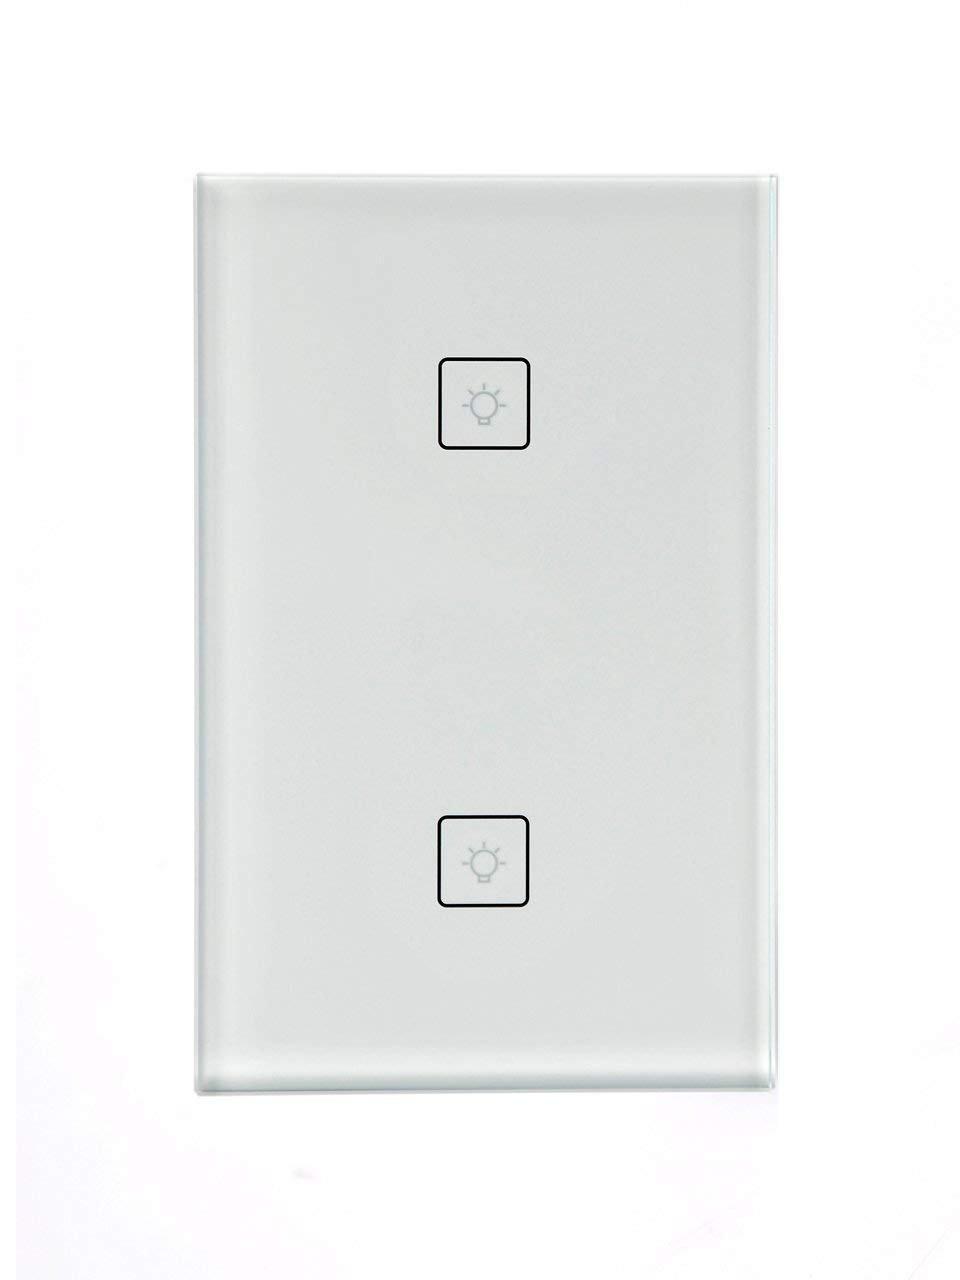 Smart Switch Wi-Fi Wall Light switch Amazon Alexa Echo and Google Home 2 in 1 Gang Box